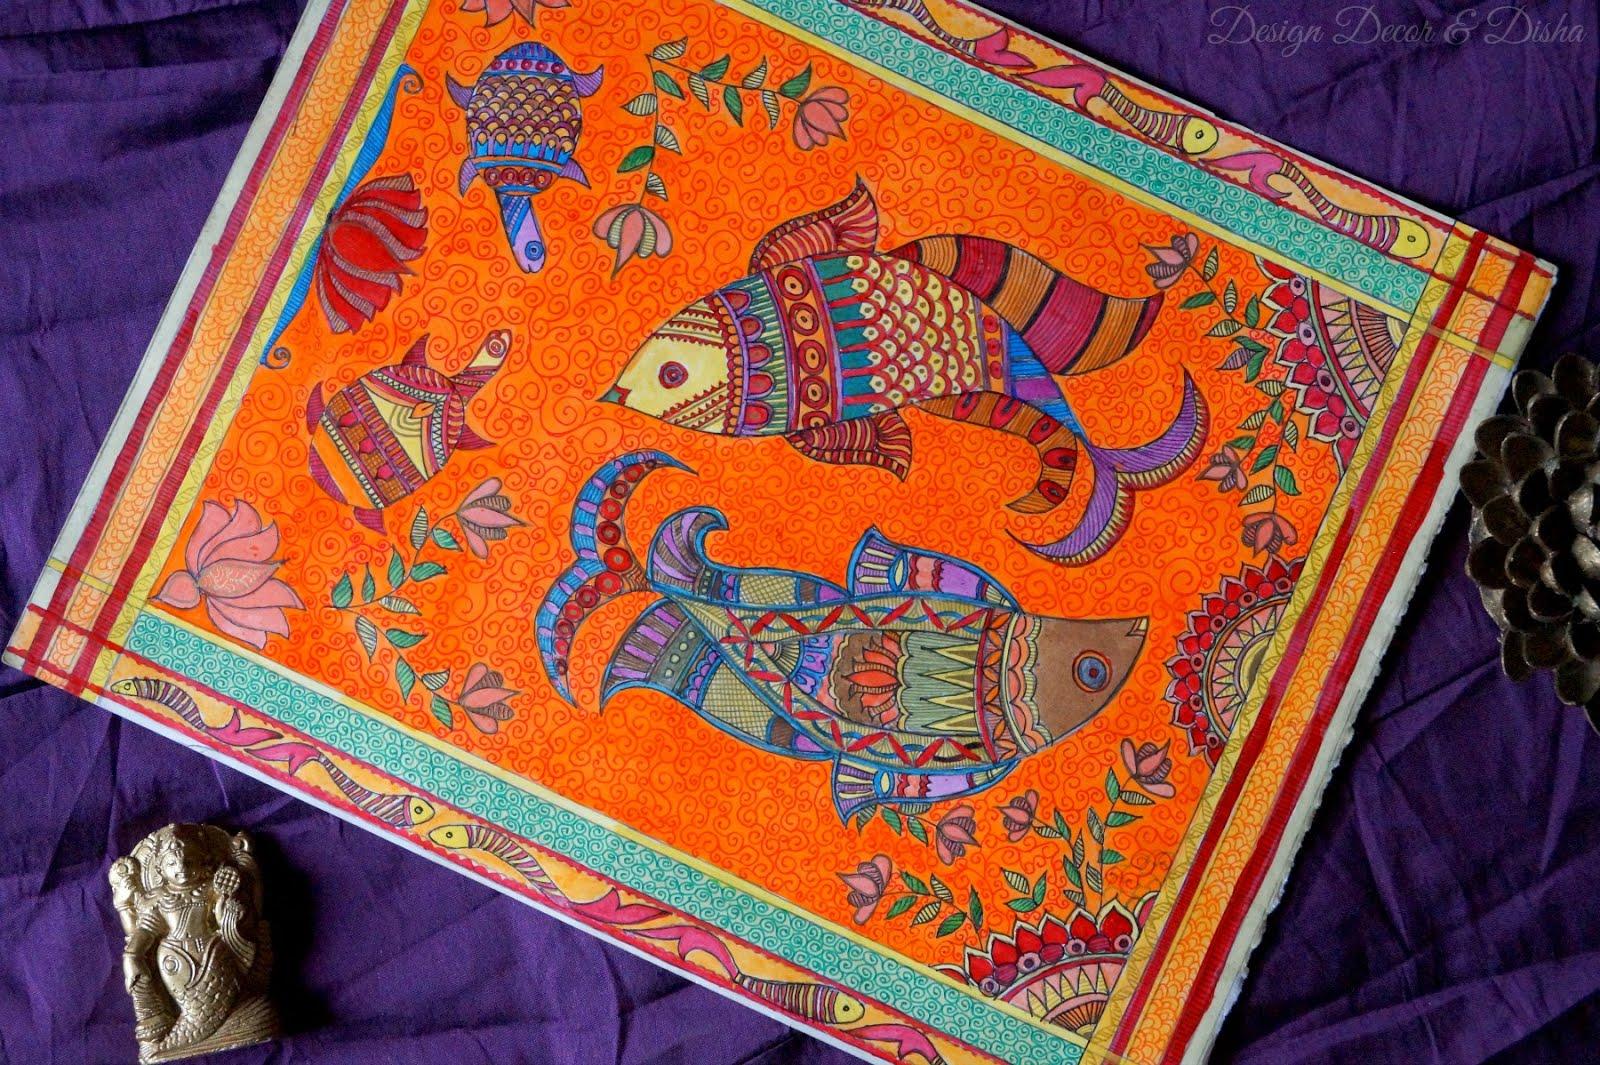 Design decor disha indian art gallery wall madhubani painting Home decor paintings for sale india